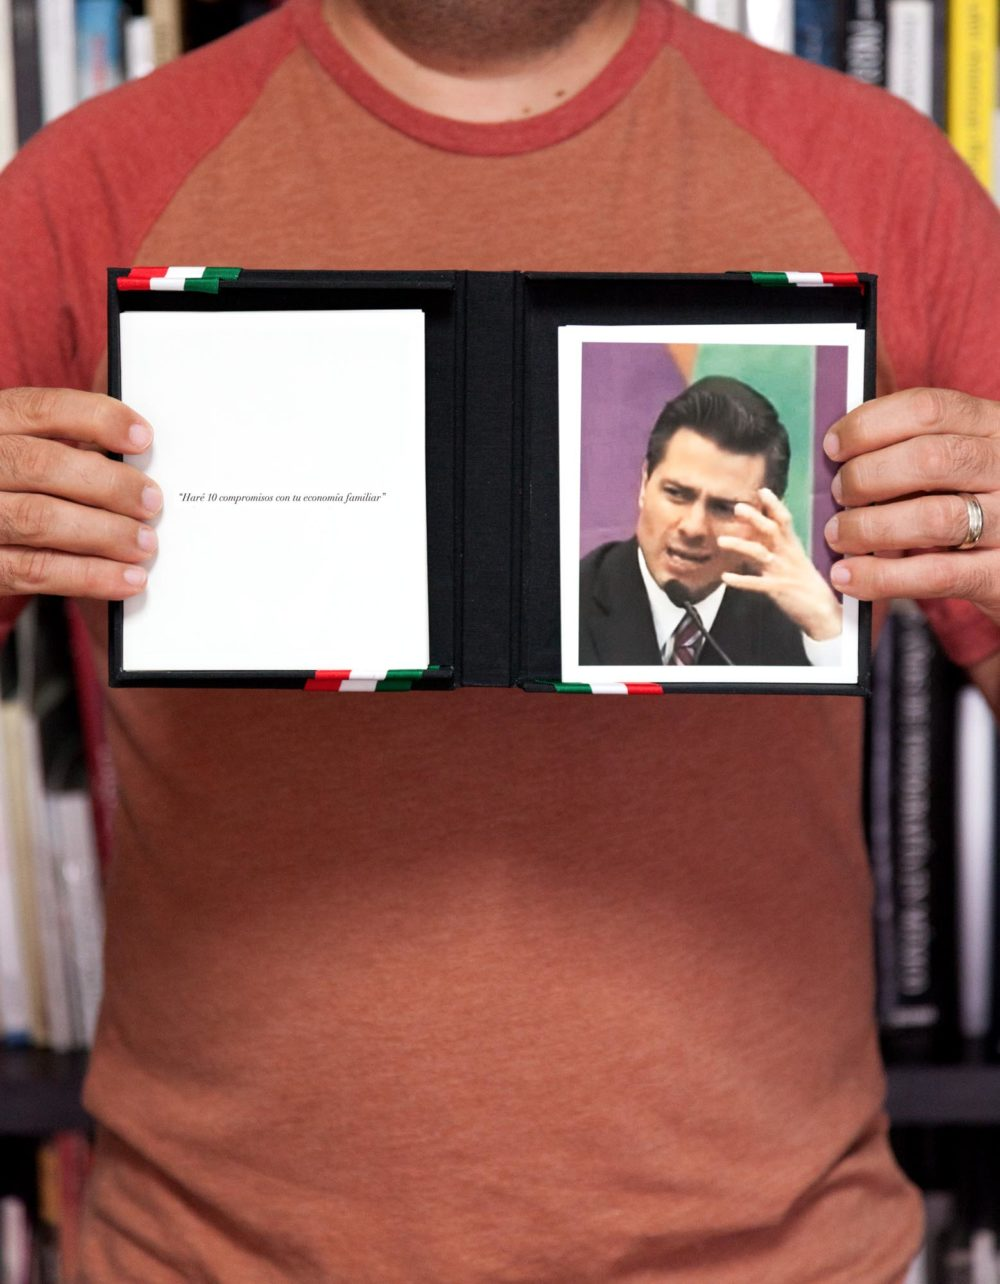 Headshots Book by Alejandro Cartagena, Published 2015 by Studio Cartagena